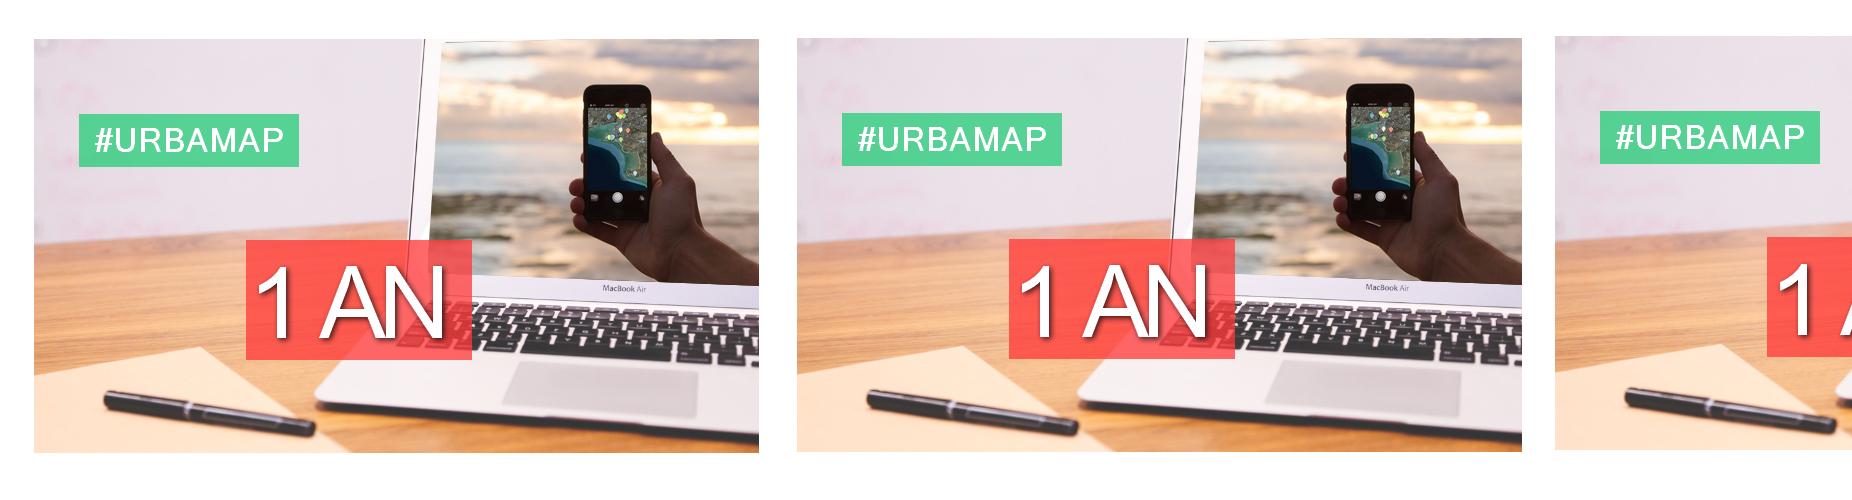 L'UrbaMap, petite deviendra (plus) grande